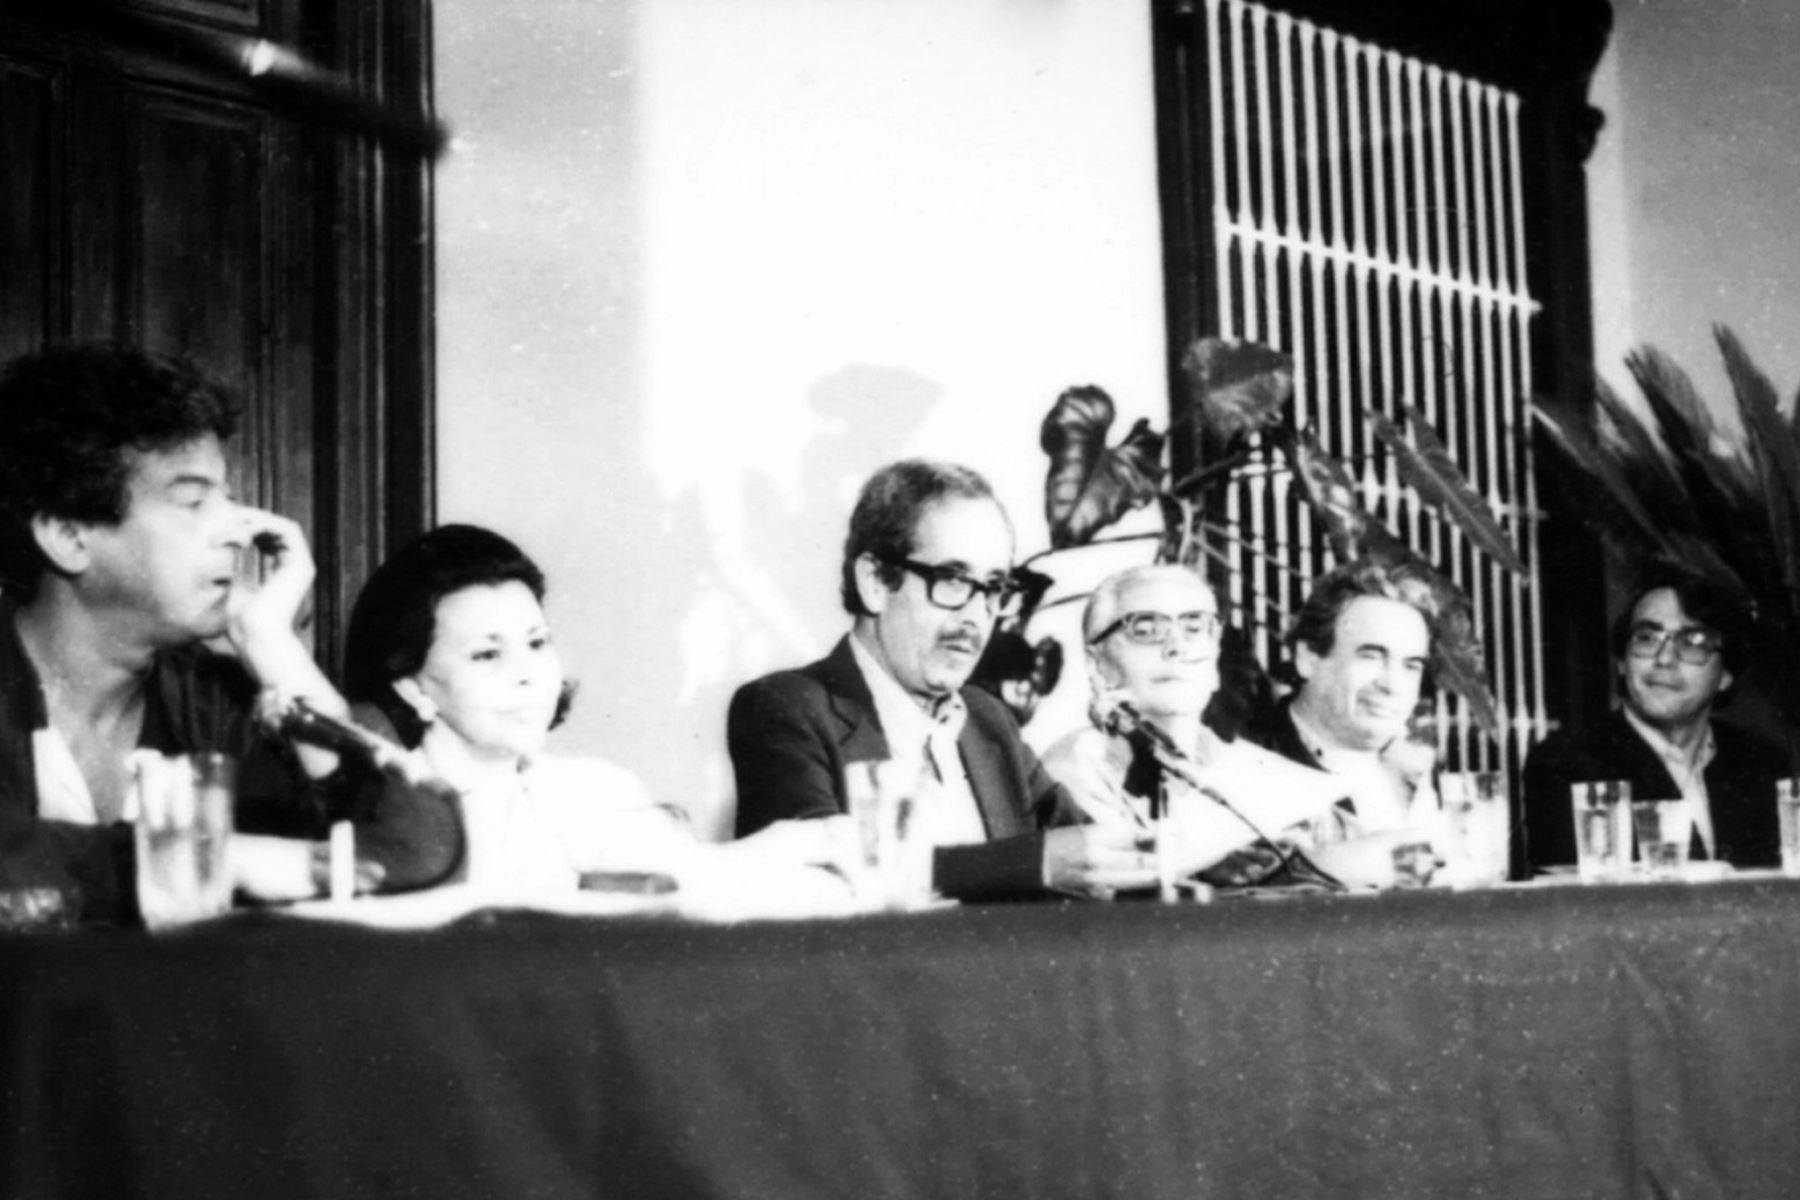 II Bienal de Poesía, Trujillo - Perú, 1987. En la foto  aparecen Blanca Varela, Antonio Cisneros, Jorge Eduardo Eielson, Javier Sologuren, Rodolfo Hinostroza y Abelardo Sánchez León. Foto: Archivo diario El Peruano